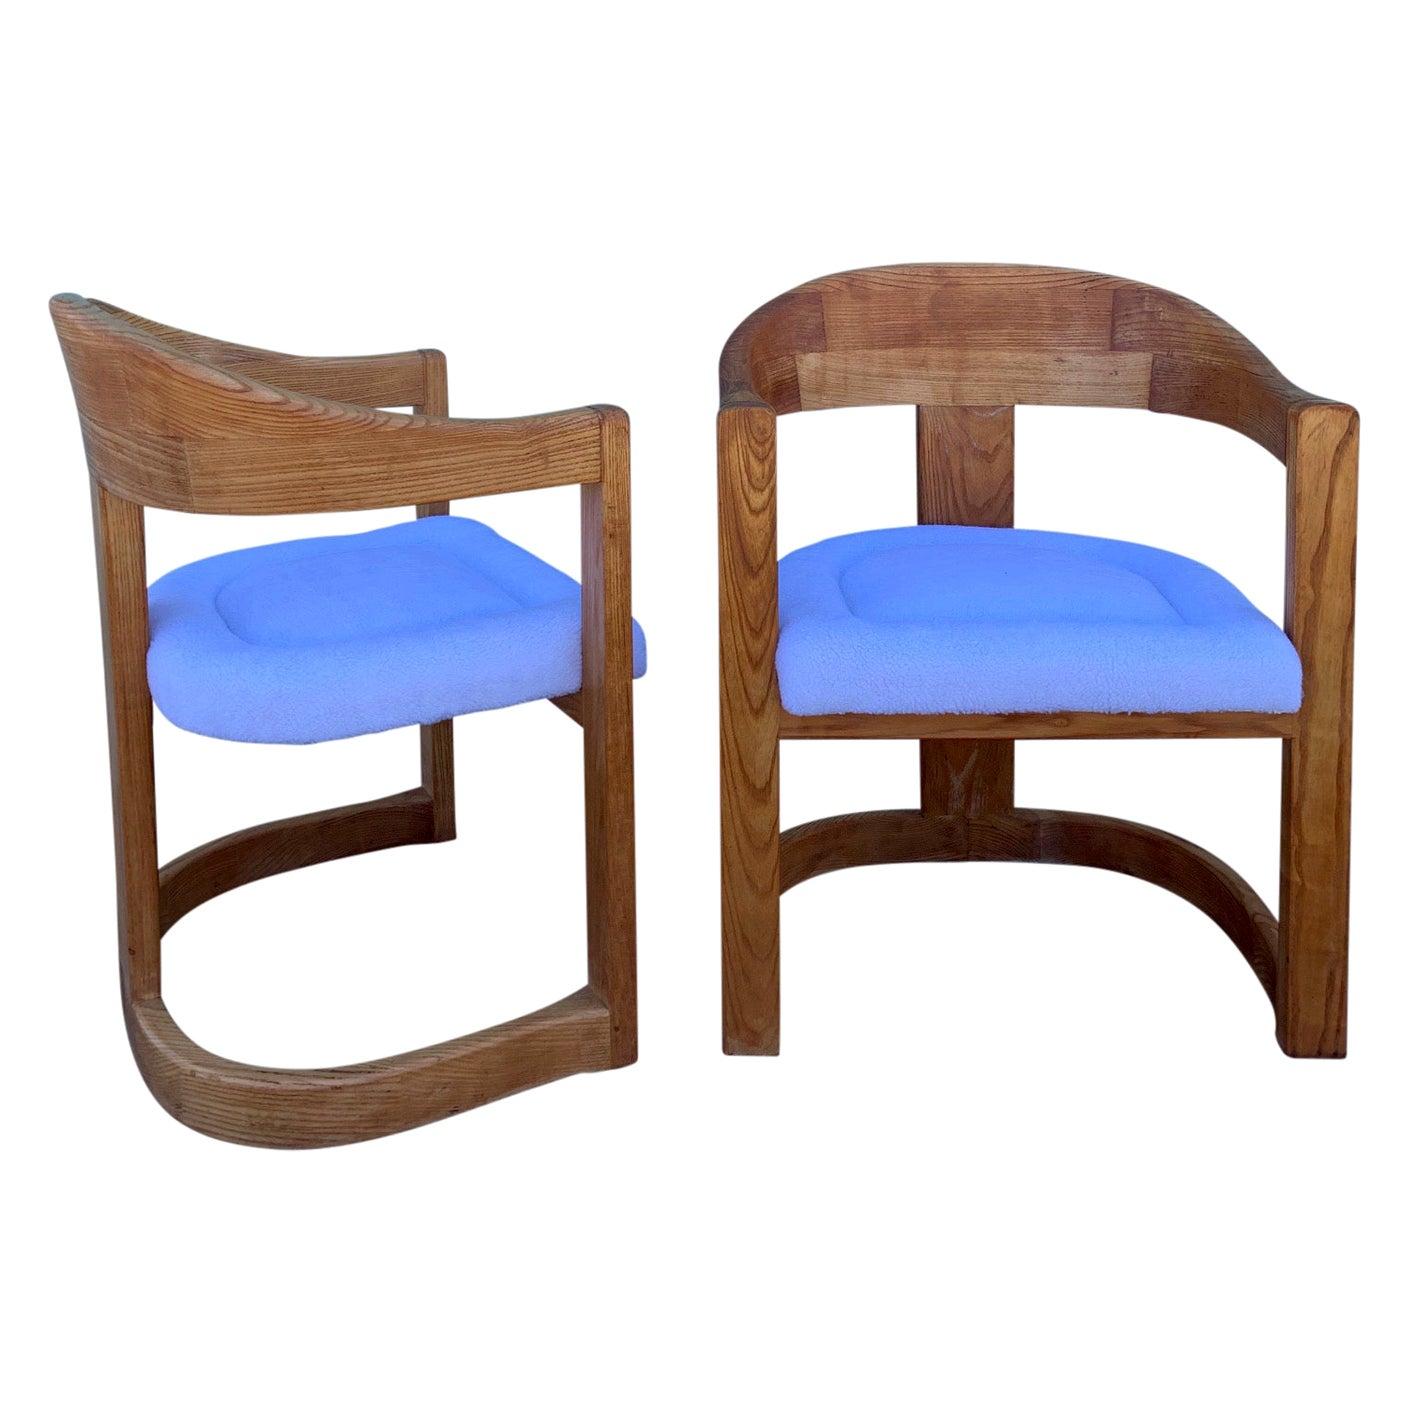 Pair of Oak Onassis Chairs by Karl Springer Mid-Century Modern